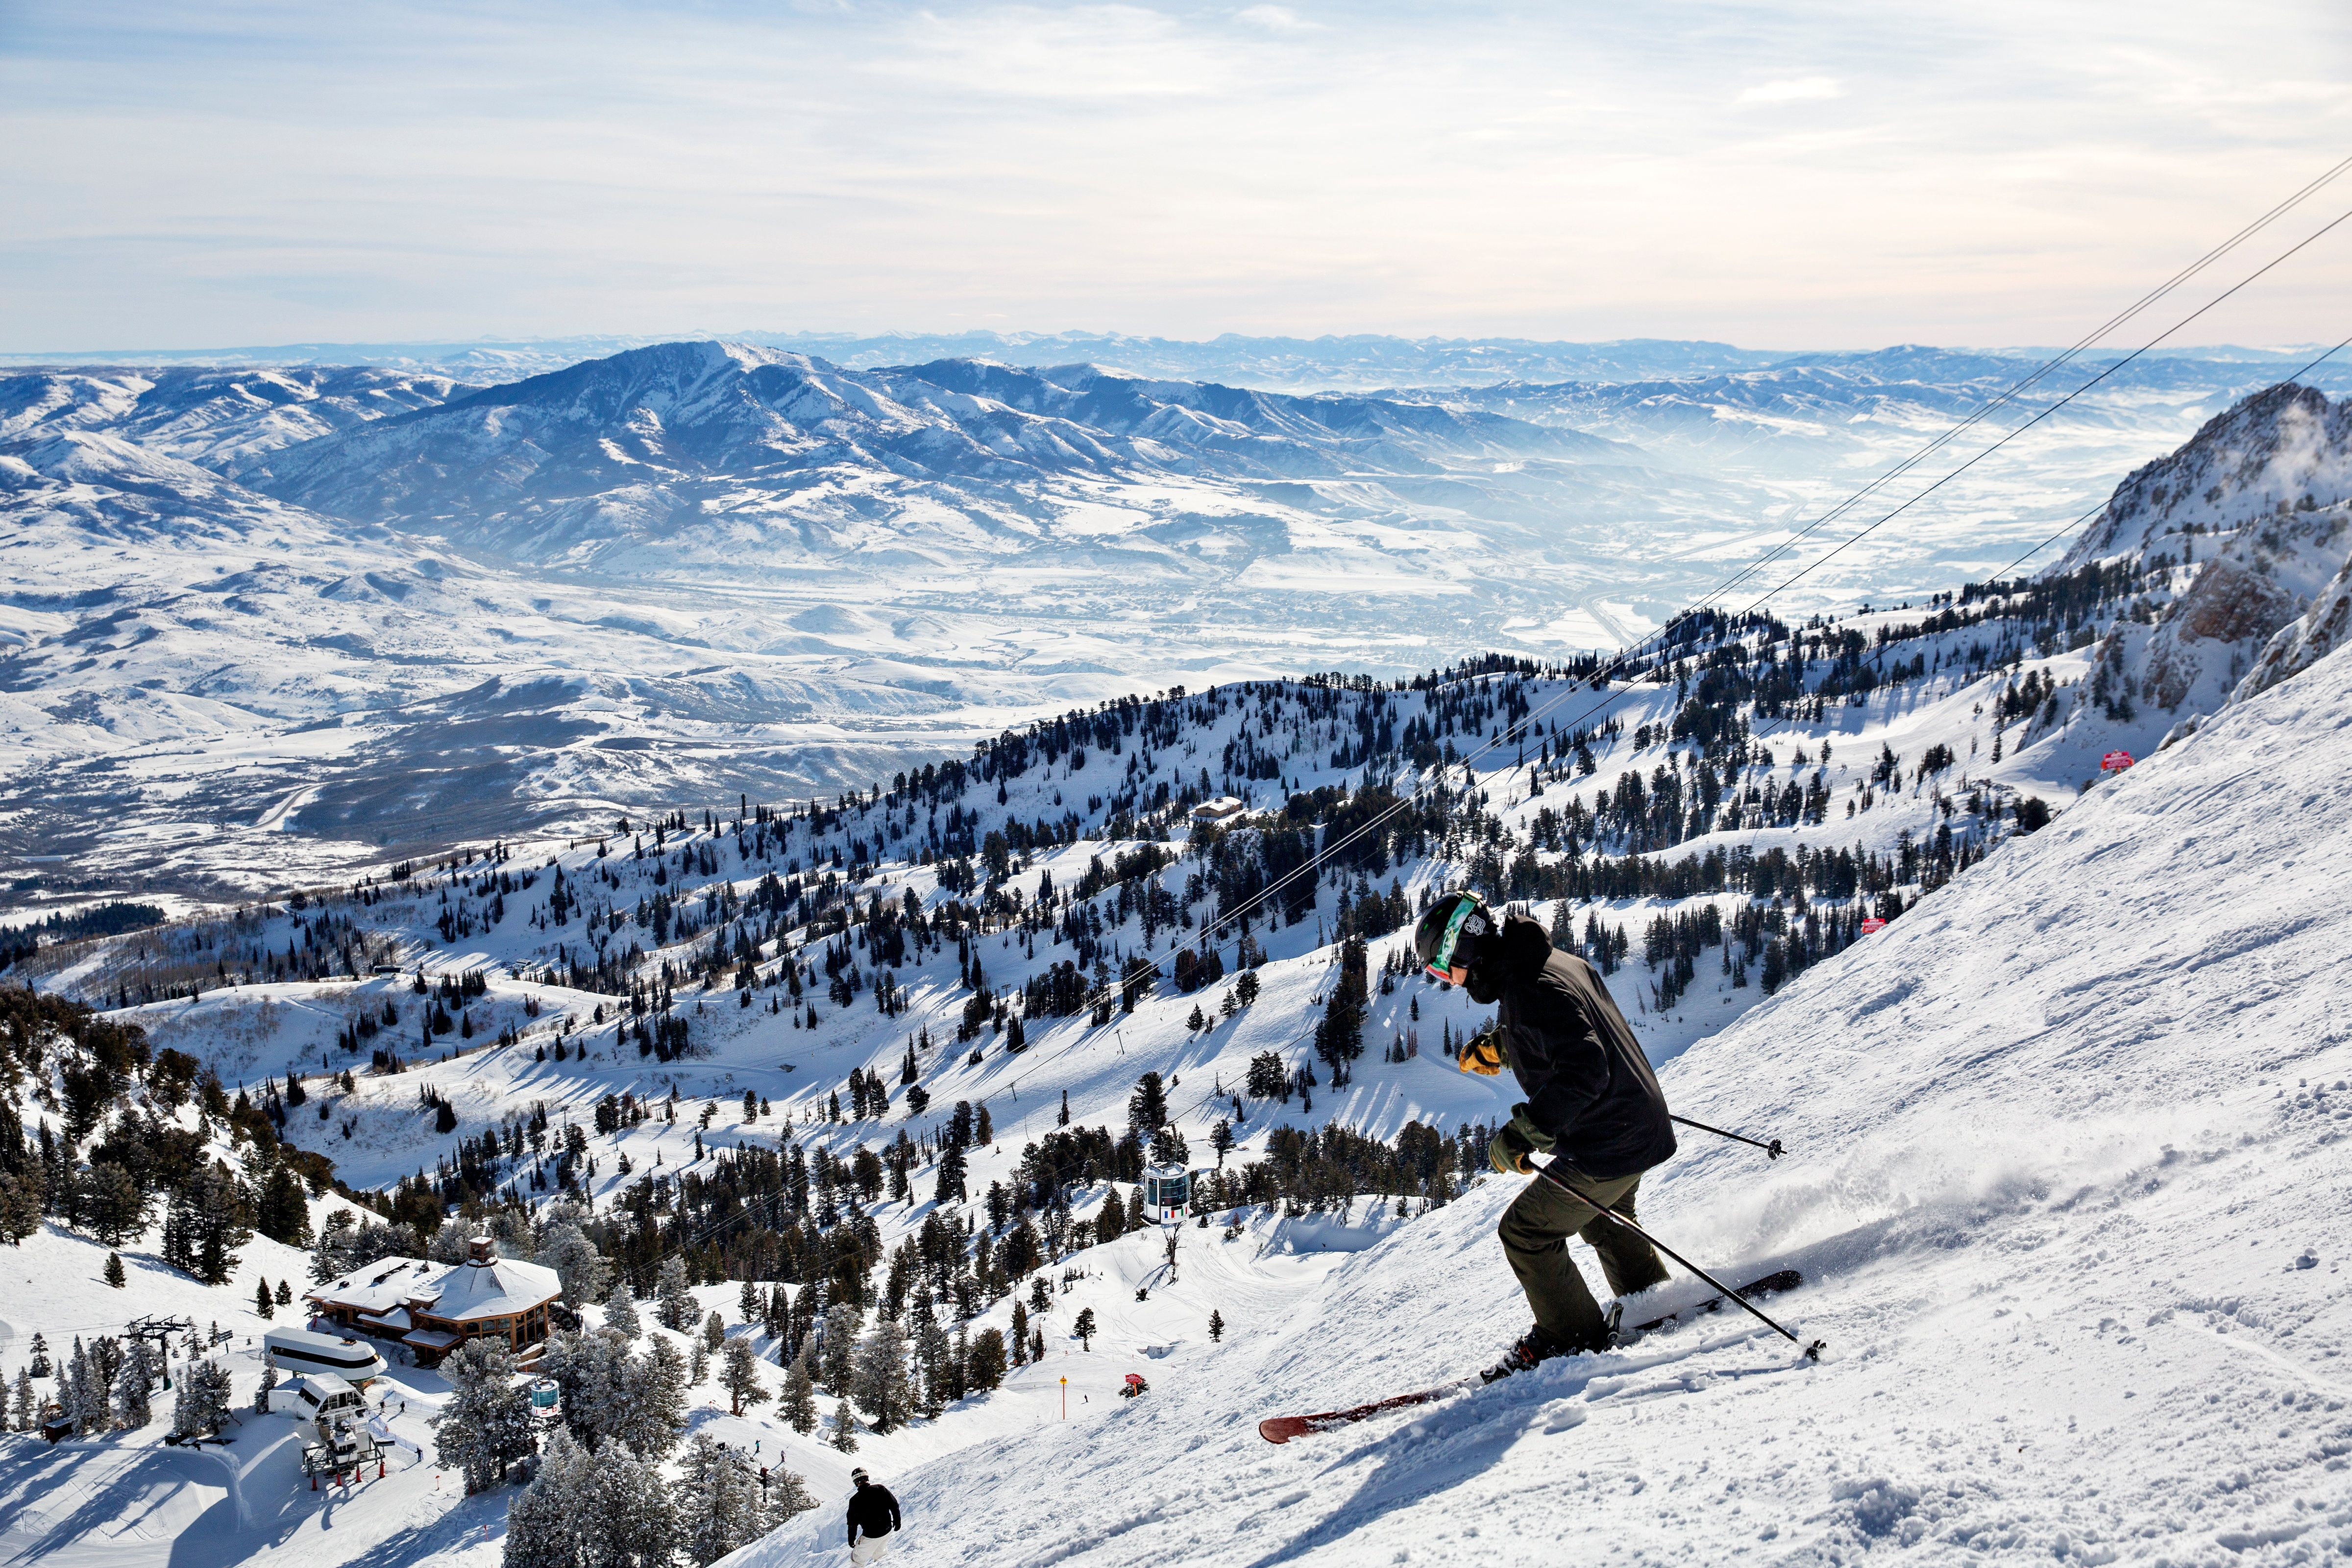 Utah Powder and Steeps, Without the Crowds in 2020 Utah